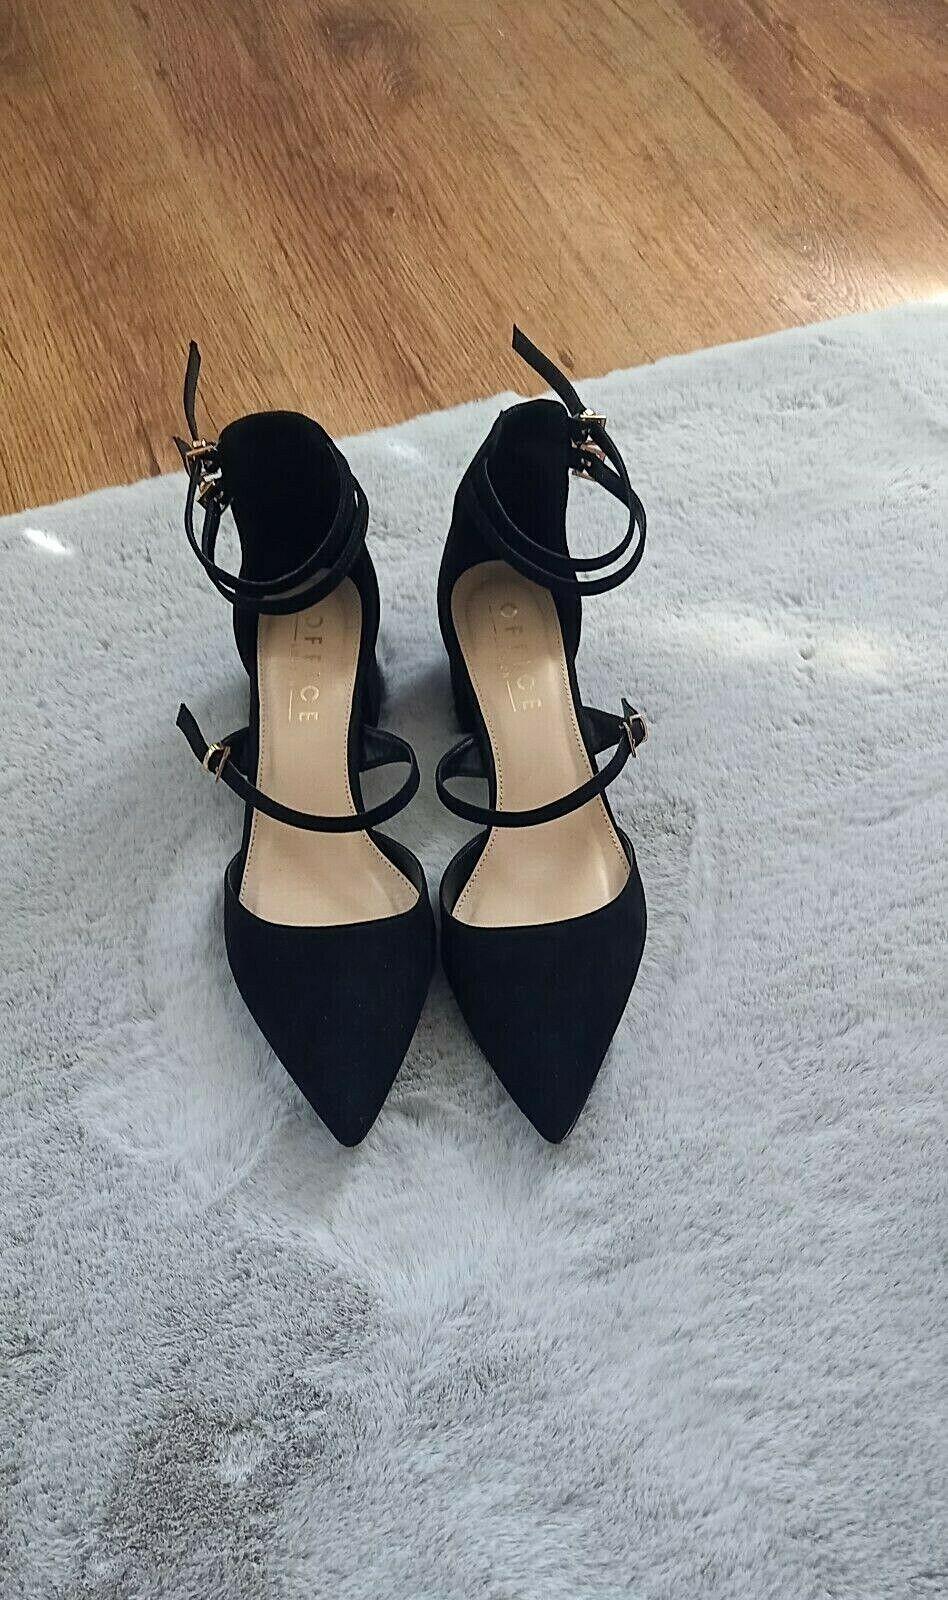 Size 6/39 black strappy heels, closed heel & toe. By Office London. S6